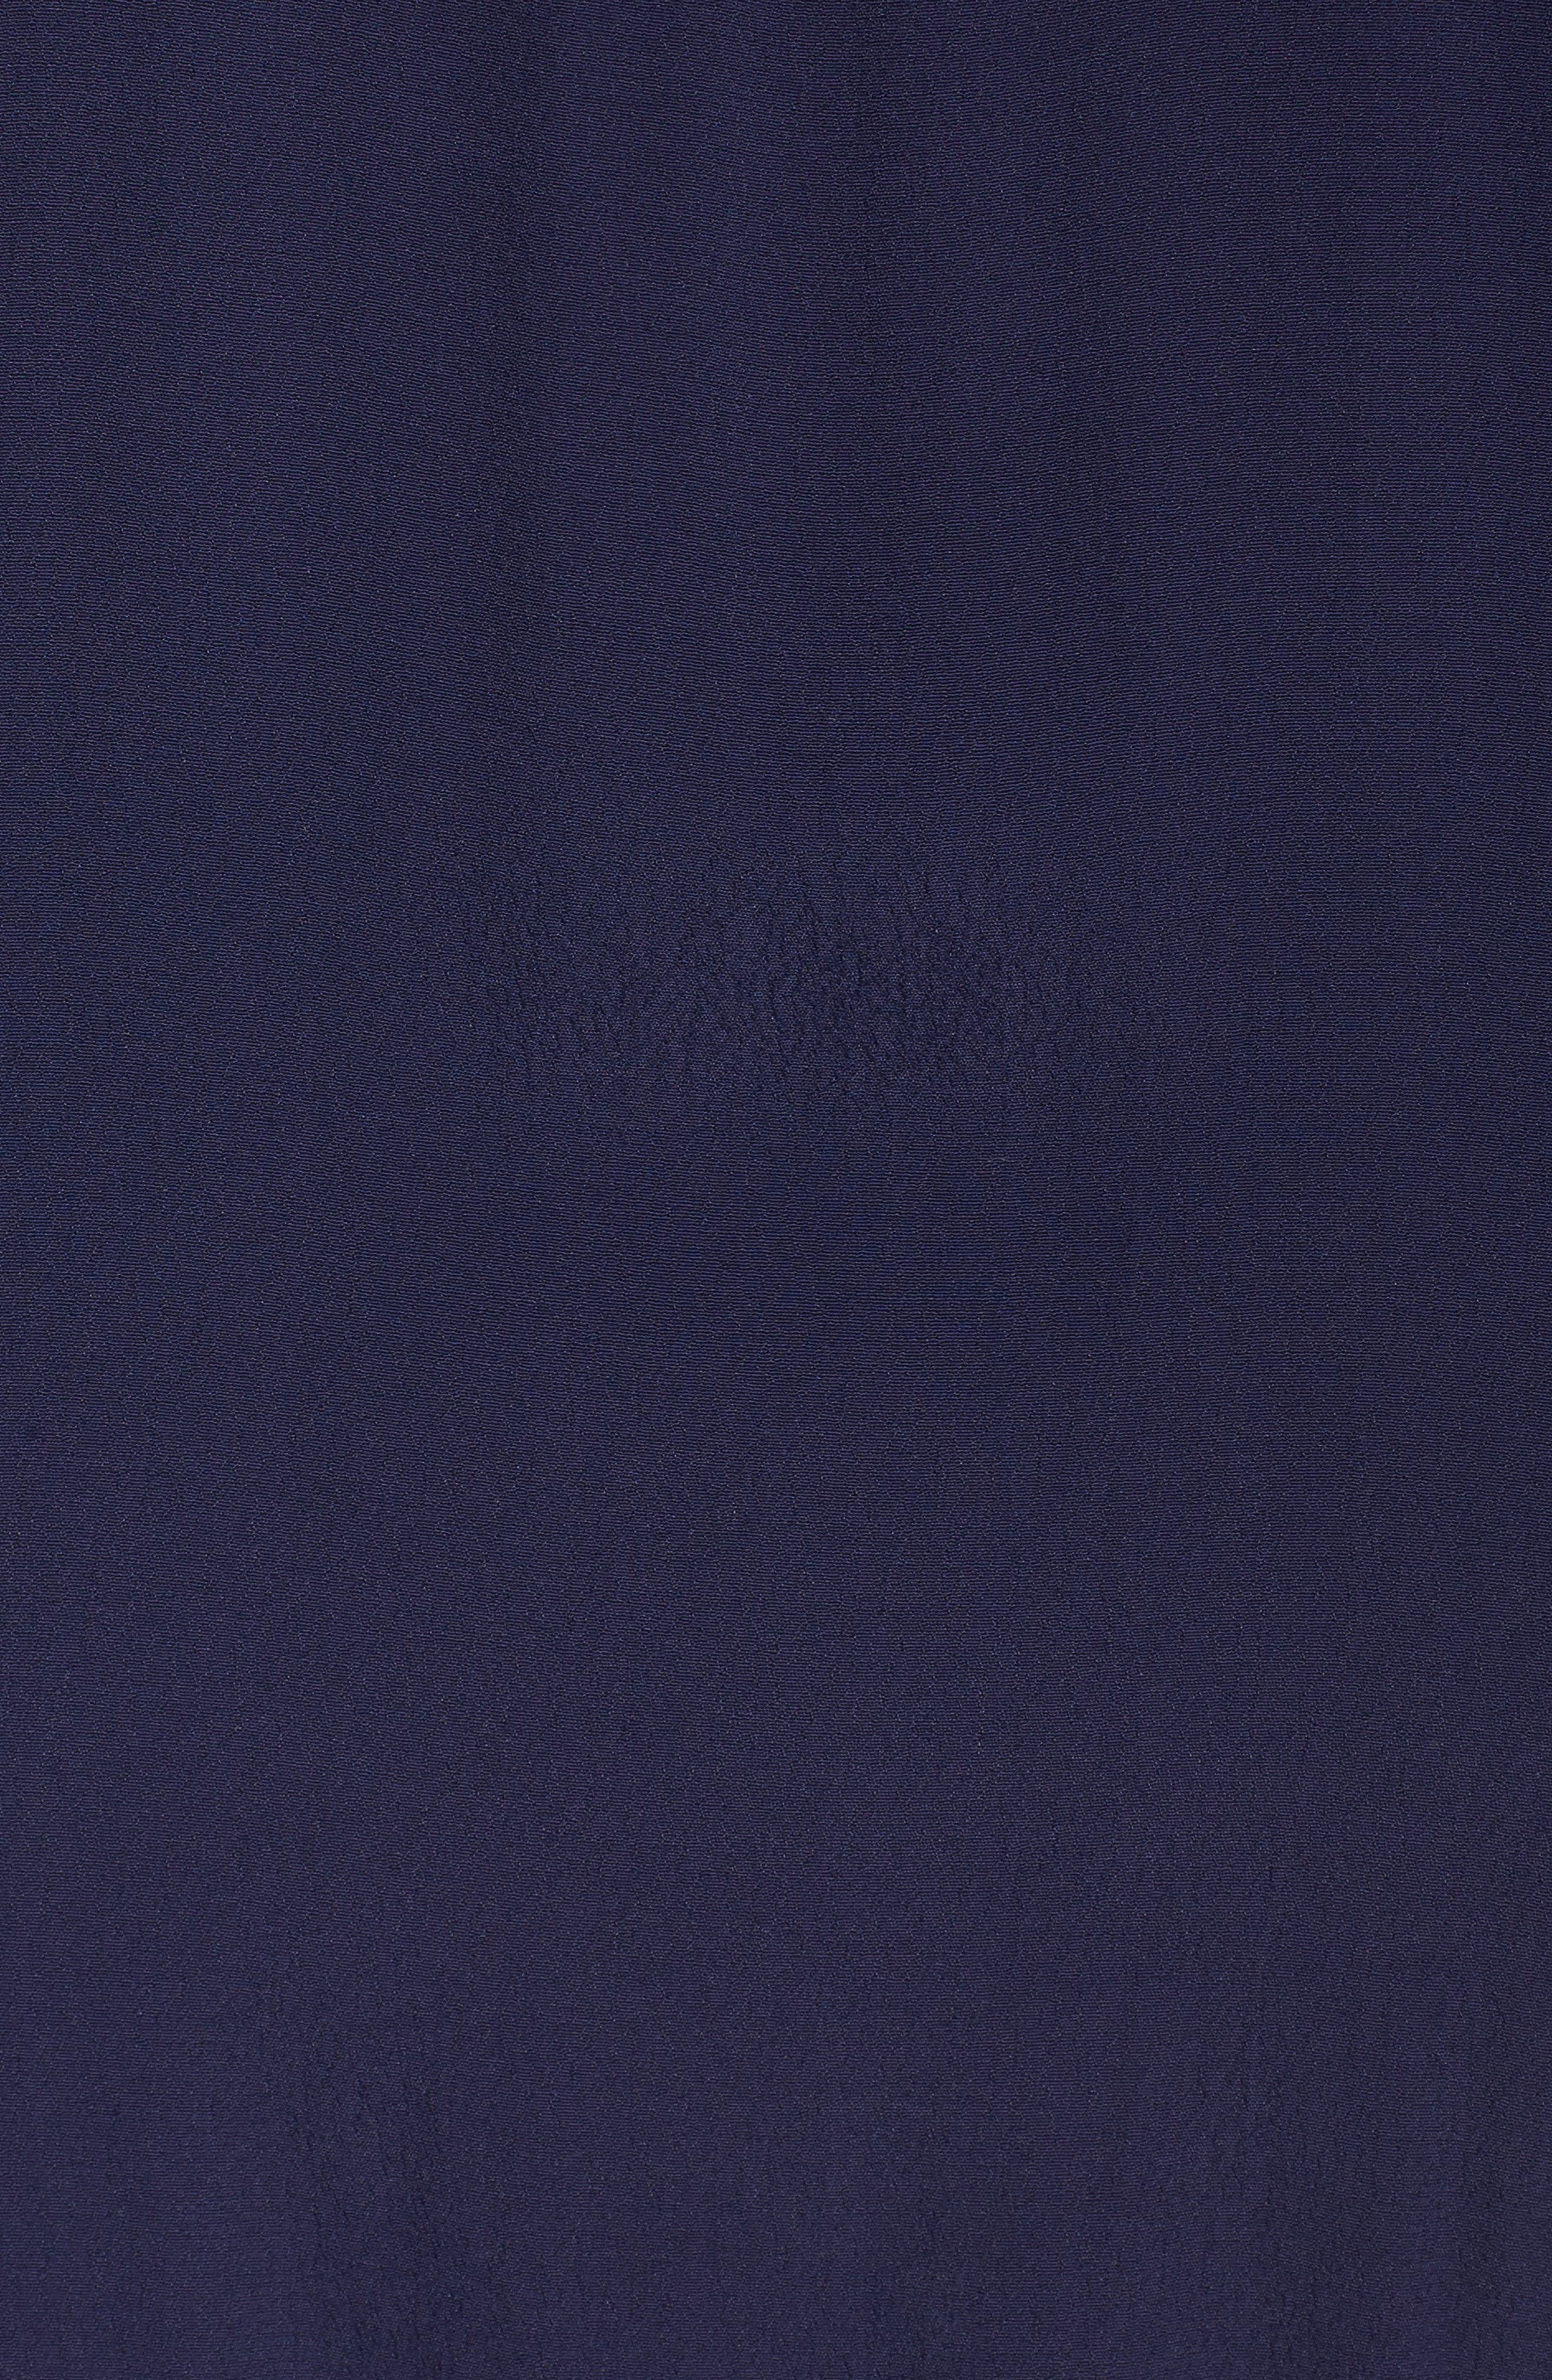 Jolie Lace Accent Cover-Up Dress,                             Alternate thumbnail 5, color,                             Navy